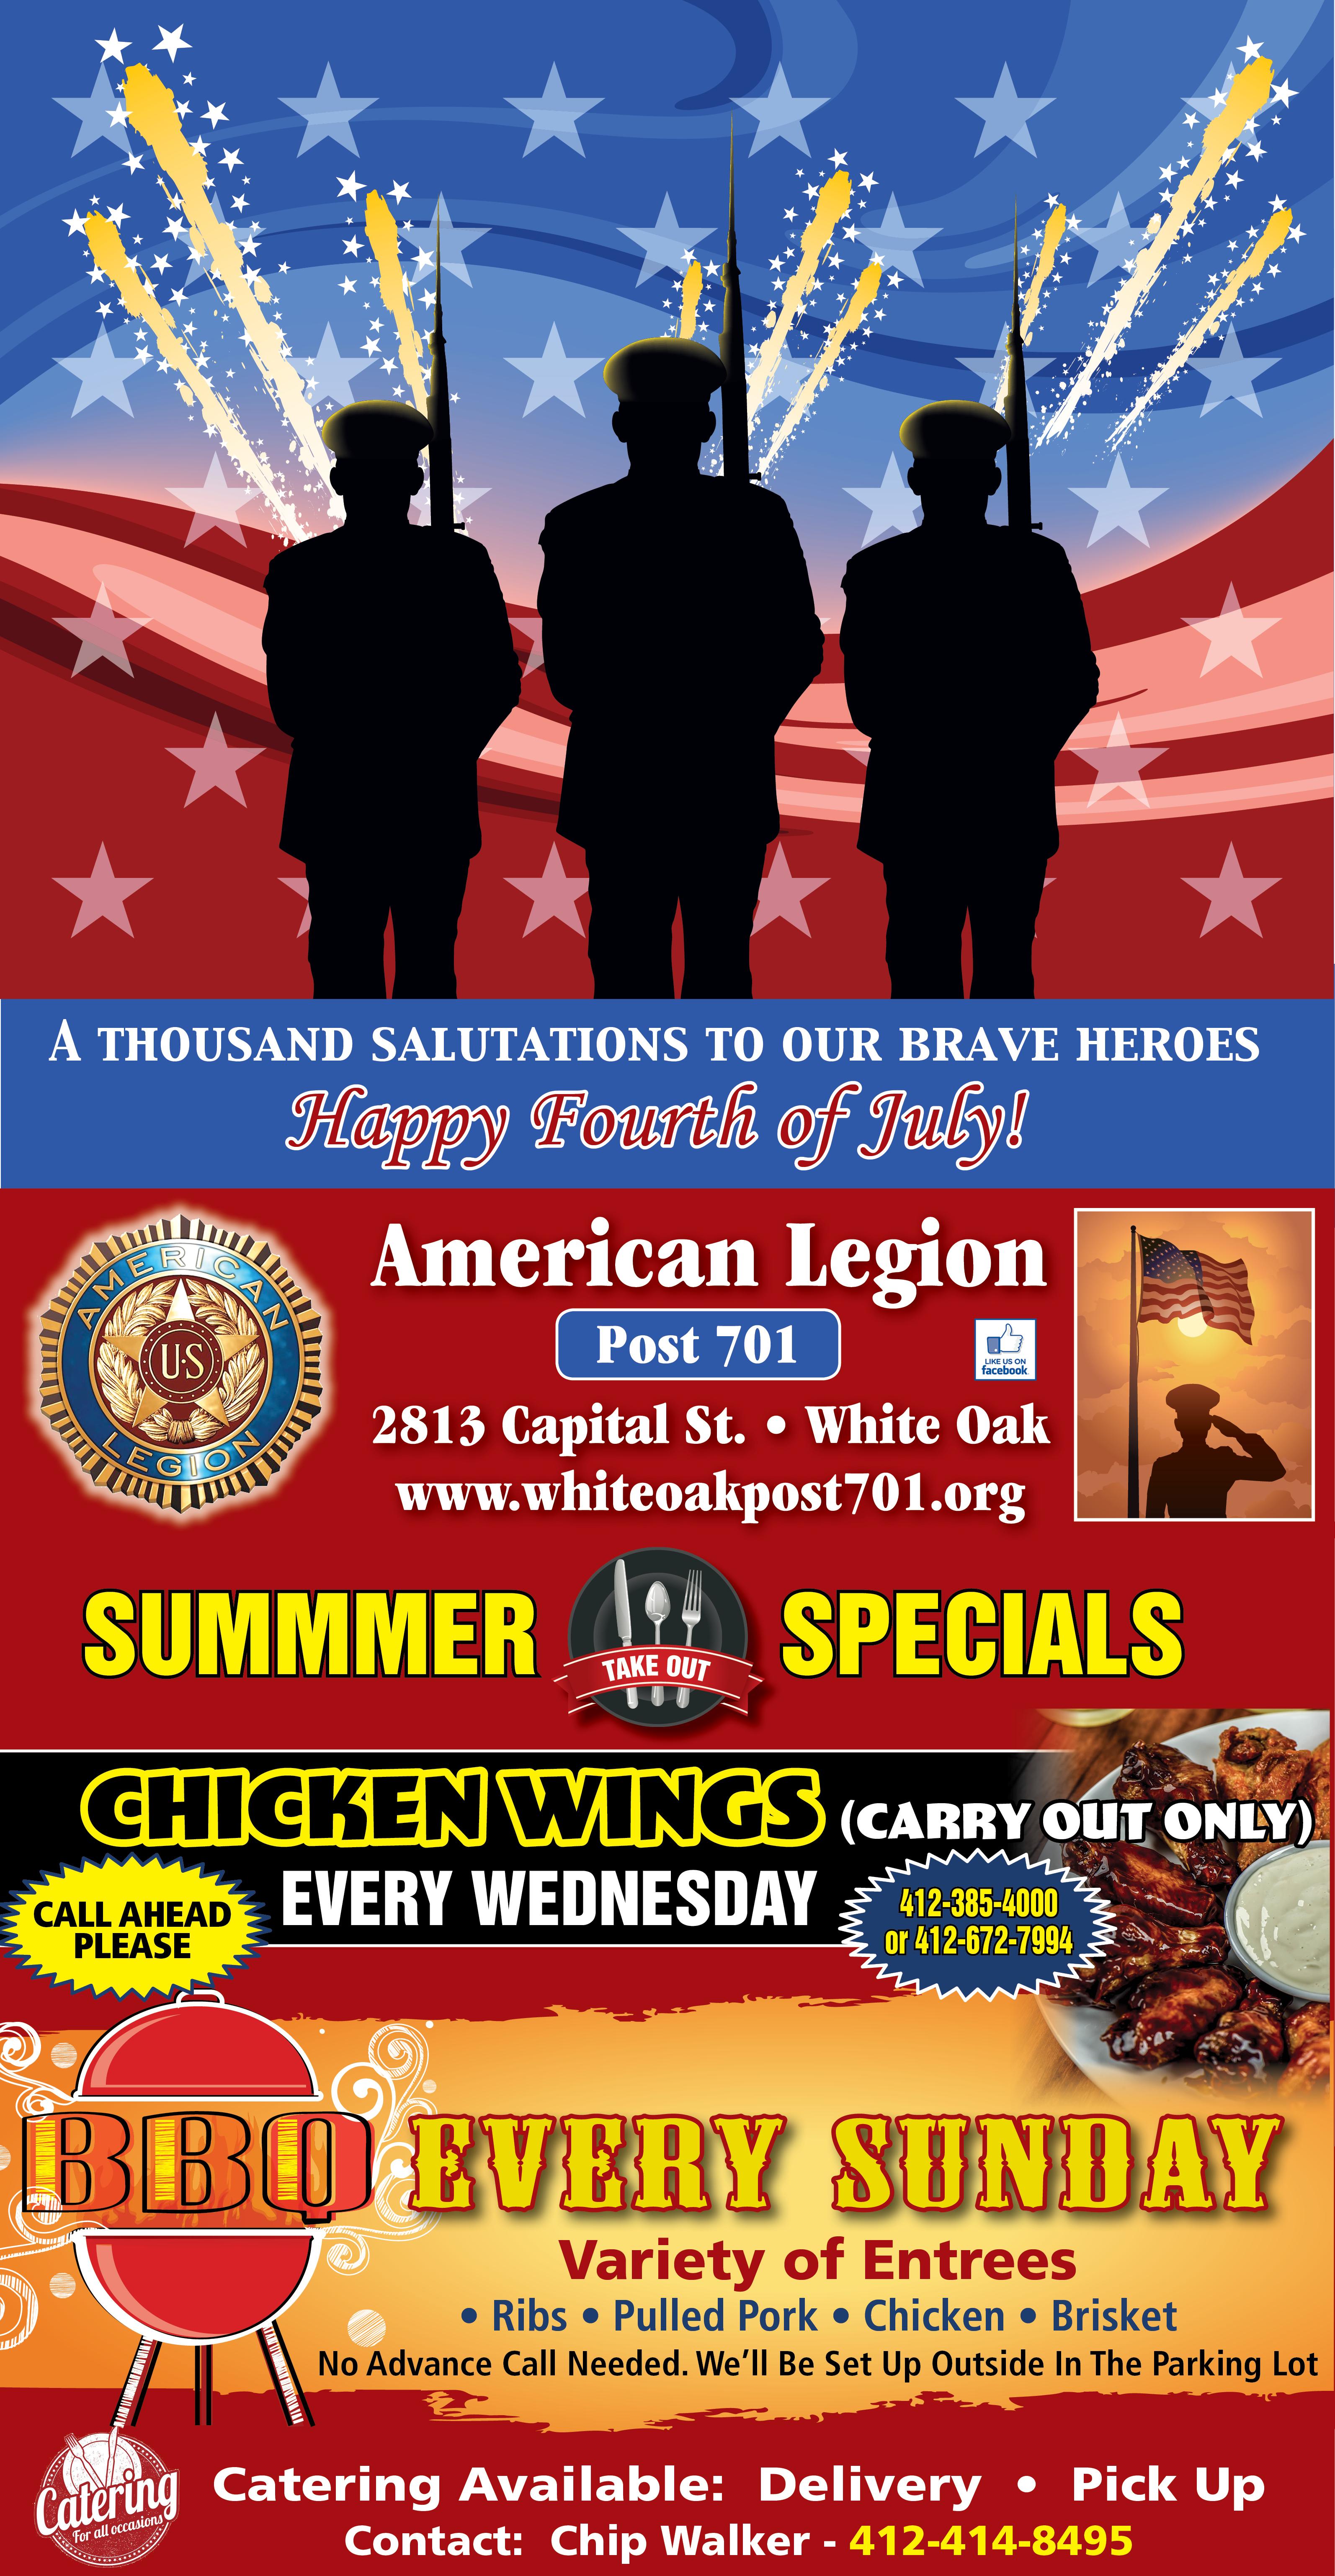 00040174_AmericanLegion_WhiteOak_July4th_6x20.50